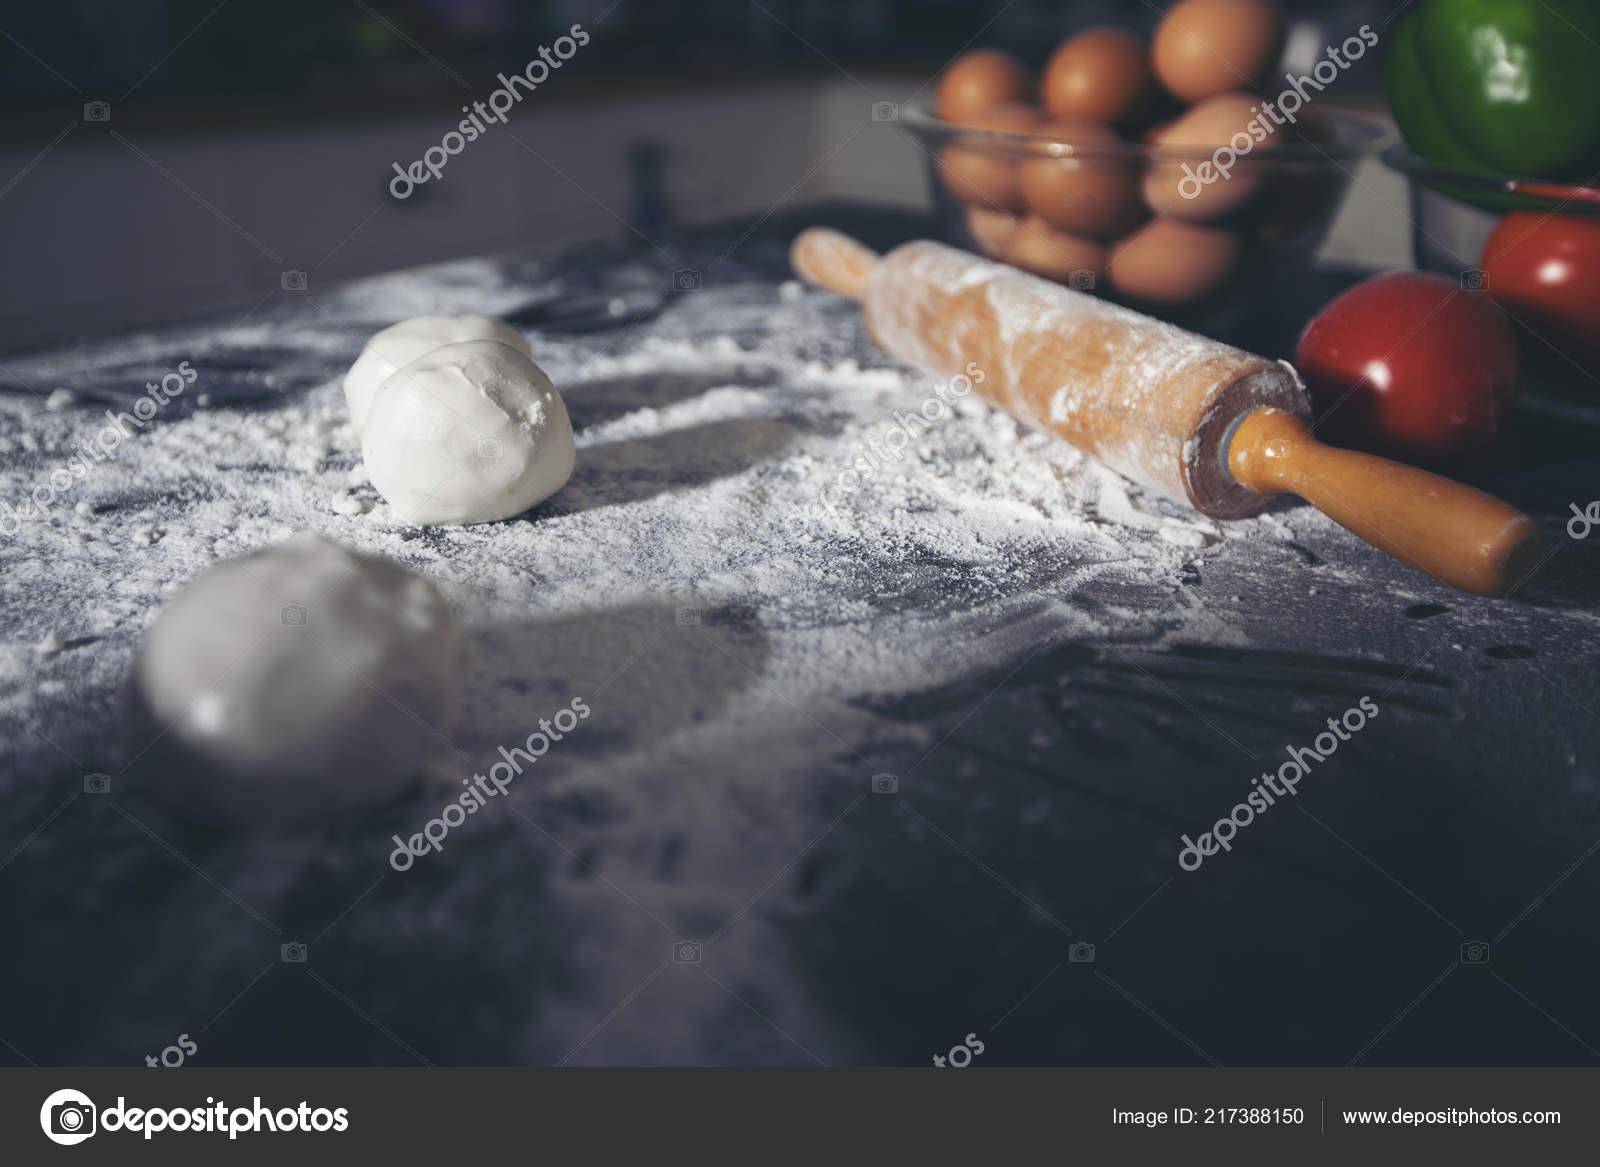 Asian Women Preparing Pizza Knead Dough Puts Ingredients ...